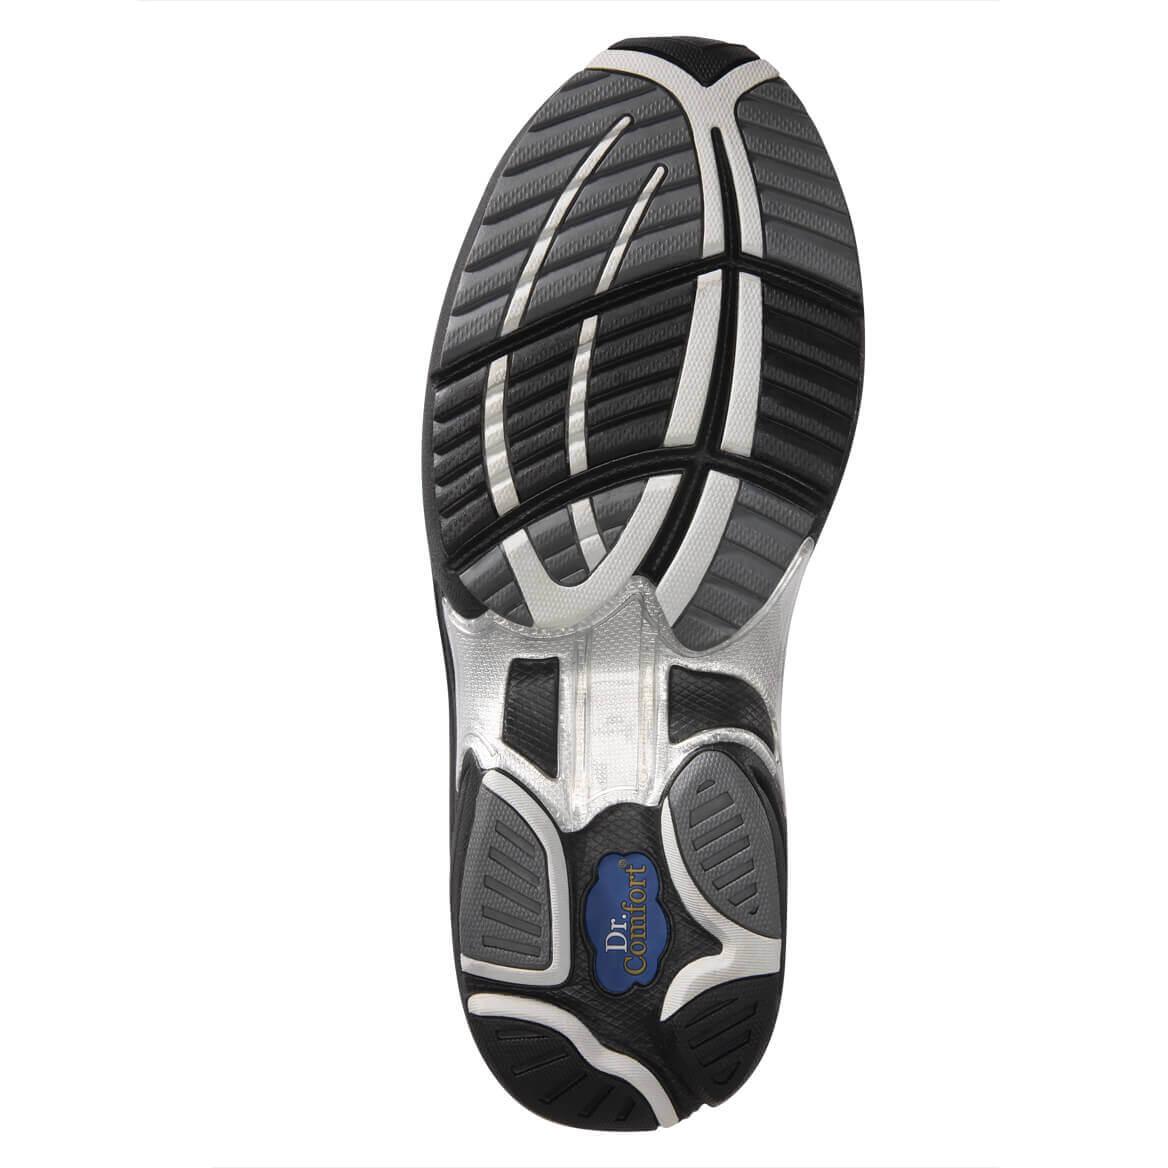 Dr. Comfort Winner Plus Men's Athletic Shoe - RTV-356134